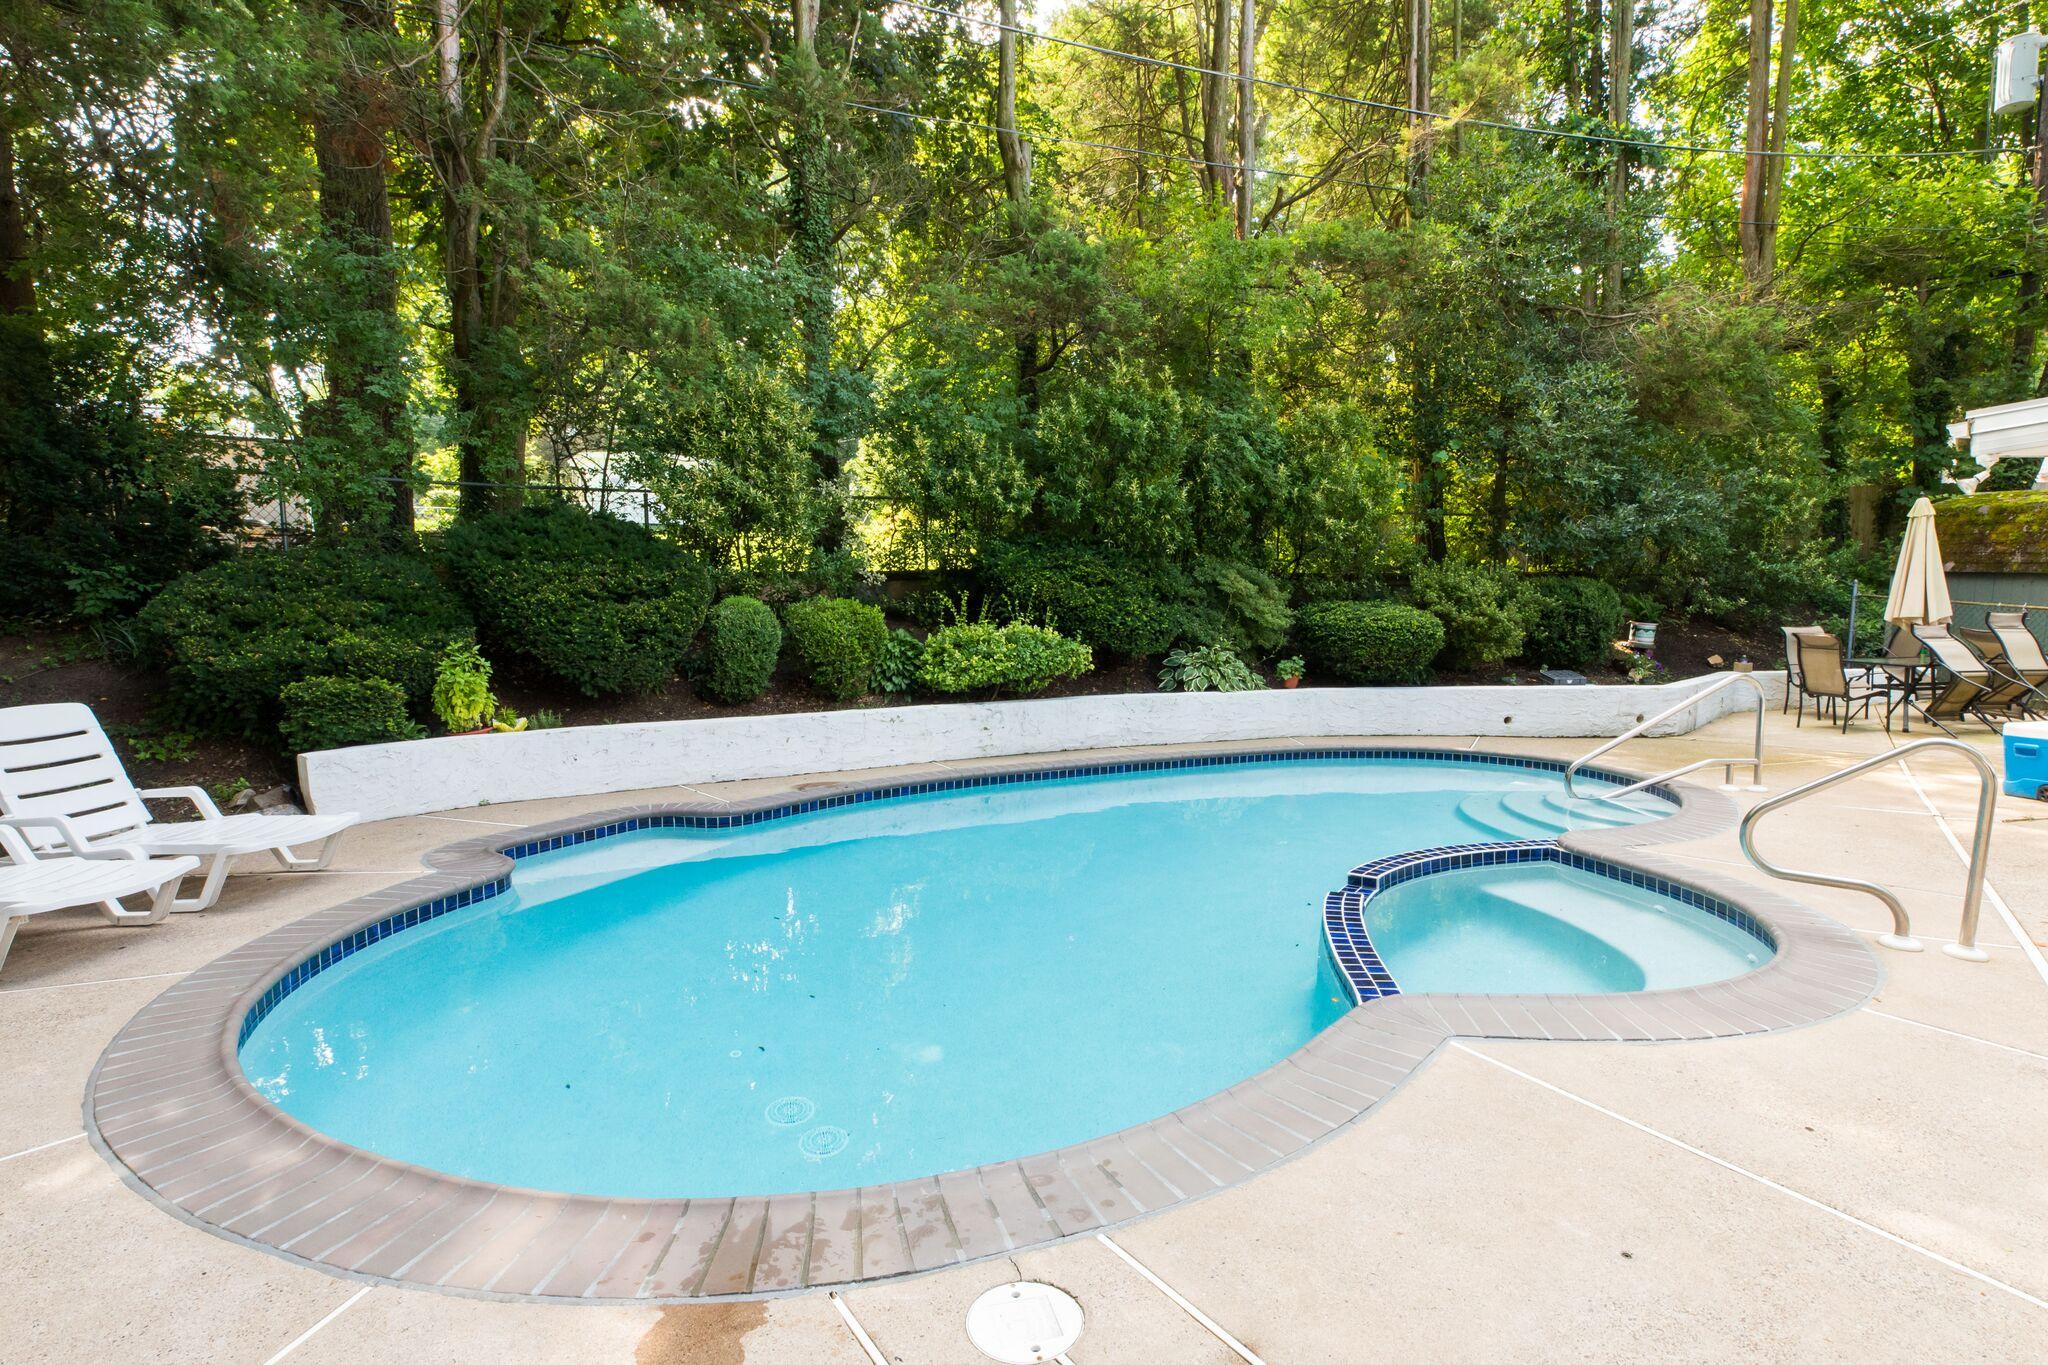 doylestown pool preparation